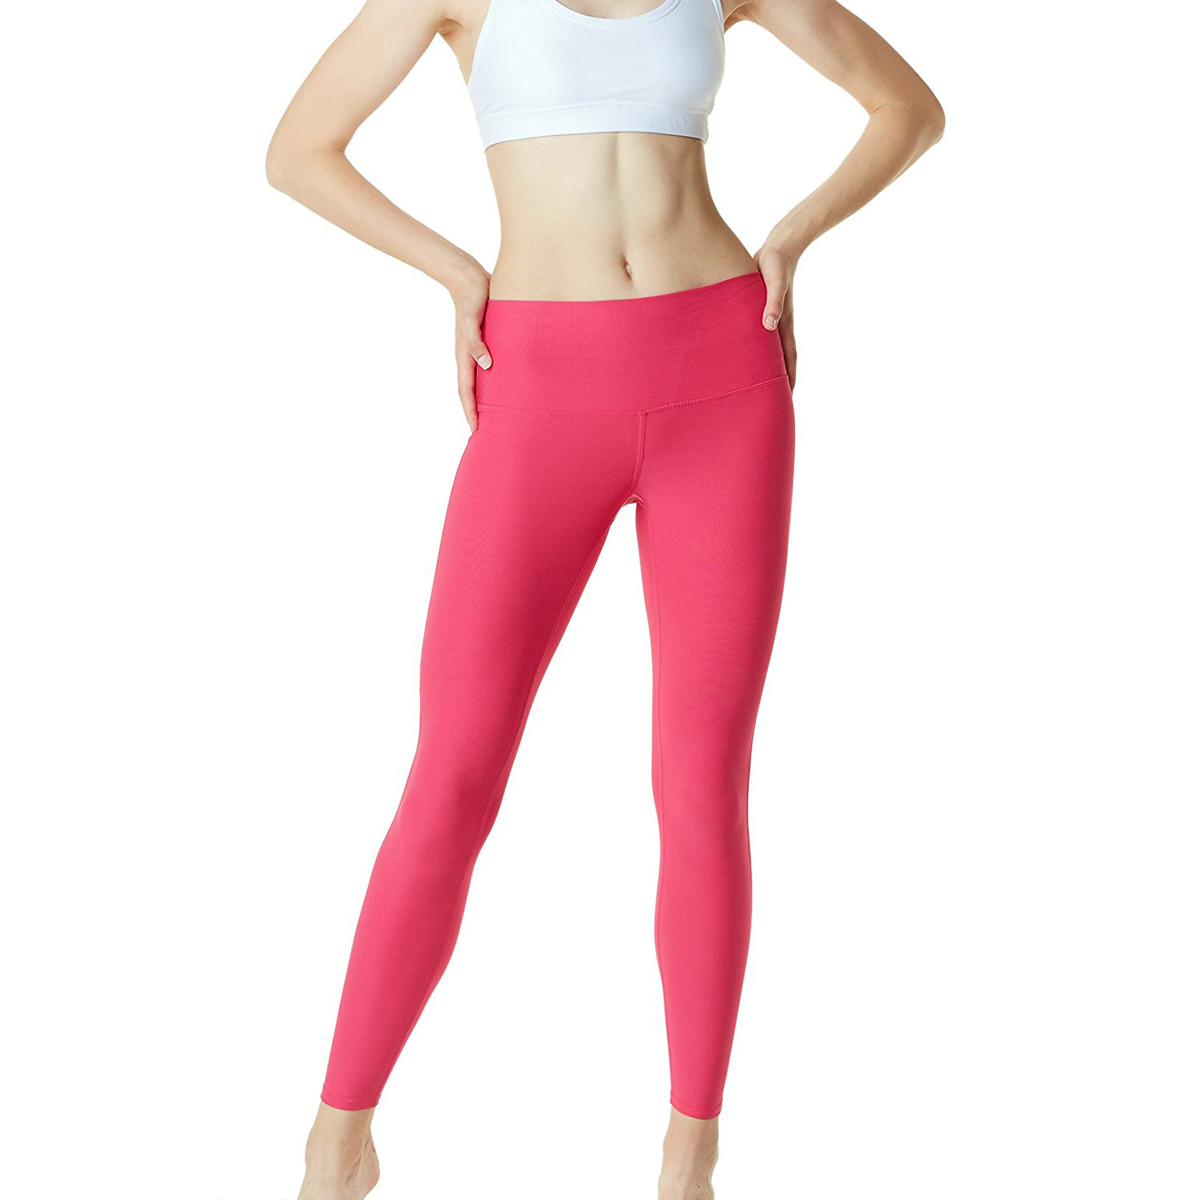 thumbnail 40 - TSLA Tesla FYP42 Women's High-Waisted Ultra-Stretch Tummy Control Yoga Pants